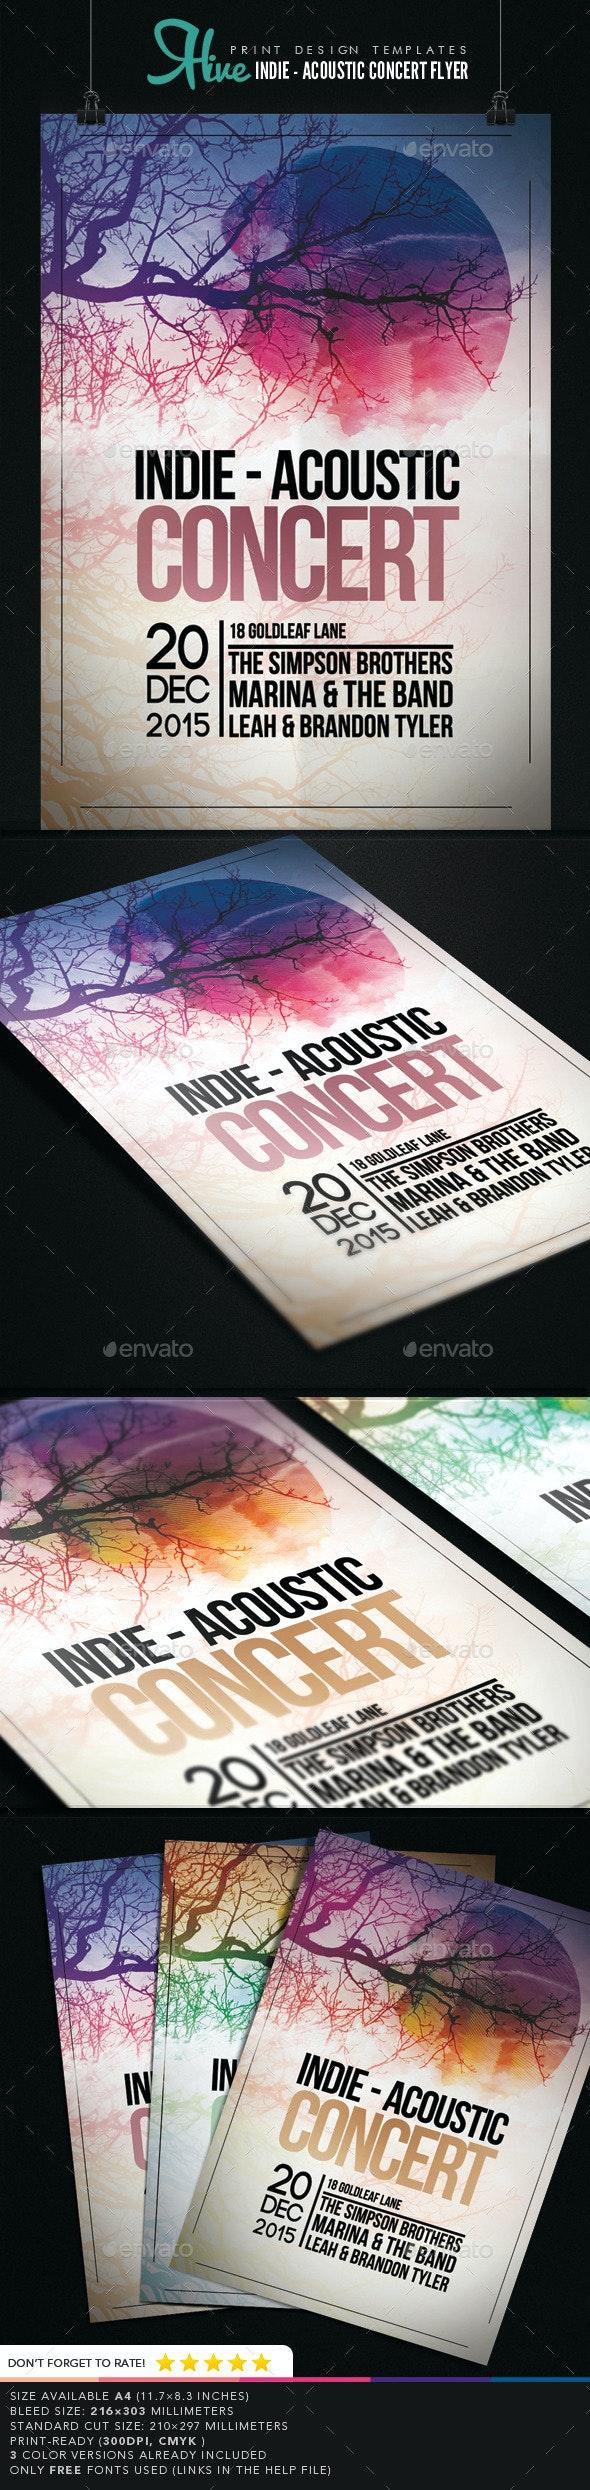 Indie - Acoustic Concert Flyer  - Concerts Events